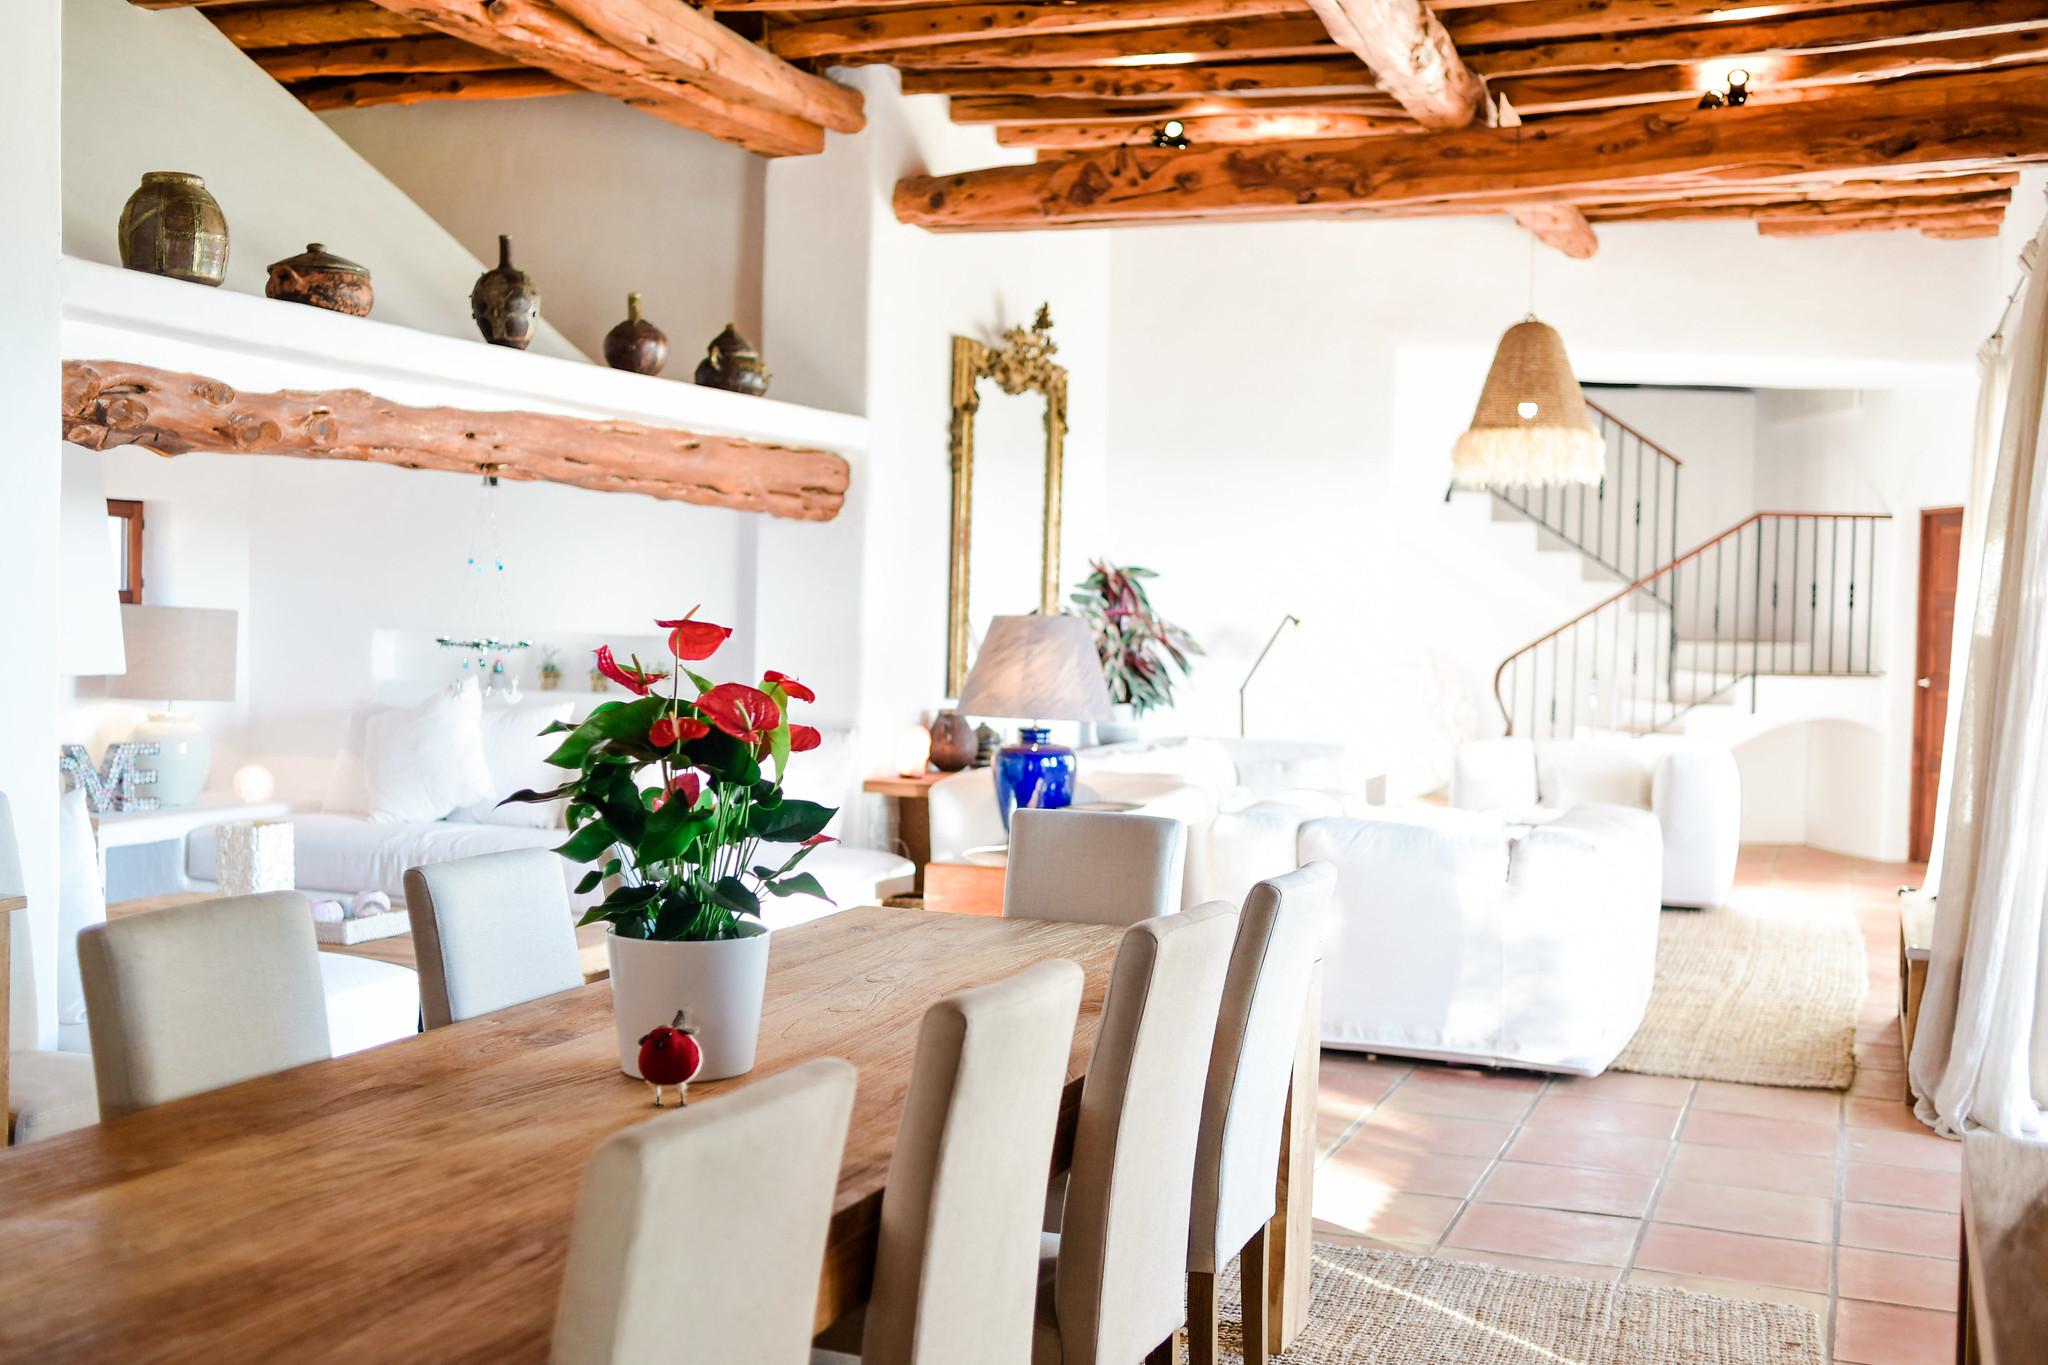 https://www.white-ibiza.com/wp-content/uploads/2020/05/white-ibiza-villas-can-lavanda-inside-dining.jpg